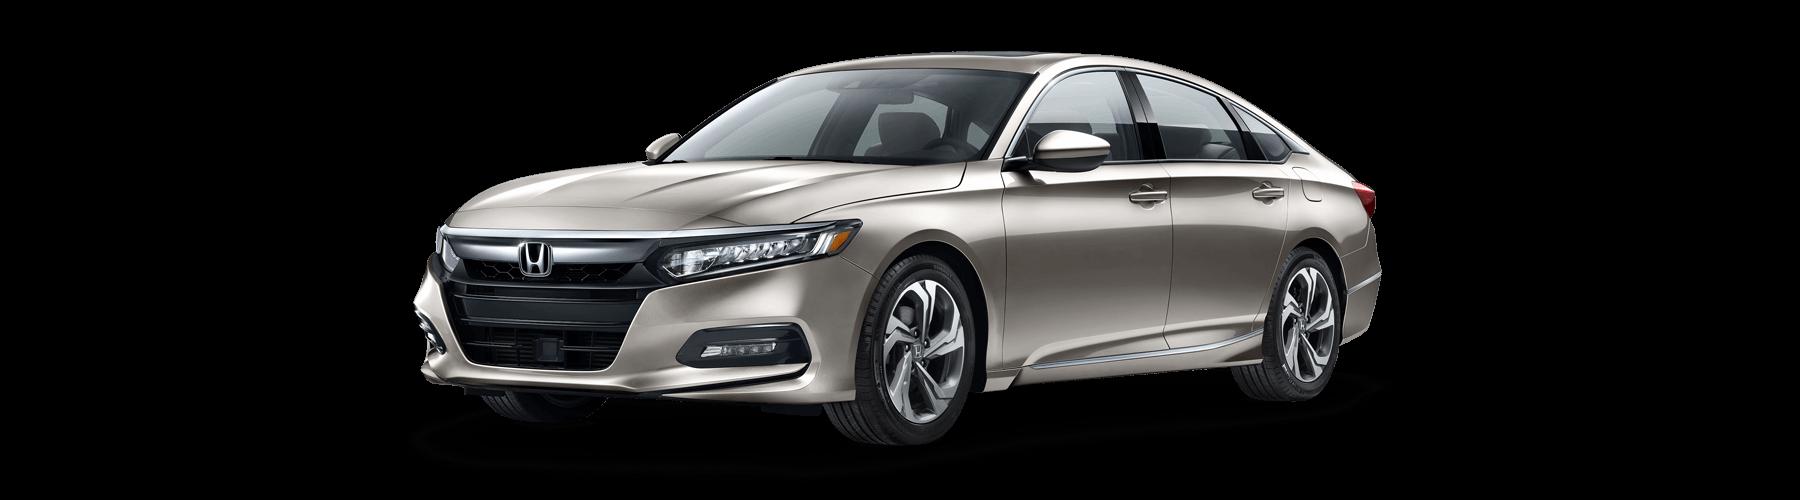 2018 Honda Accord Sedan Front Angle